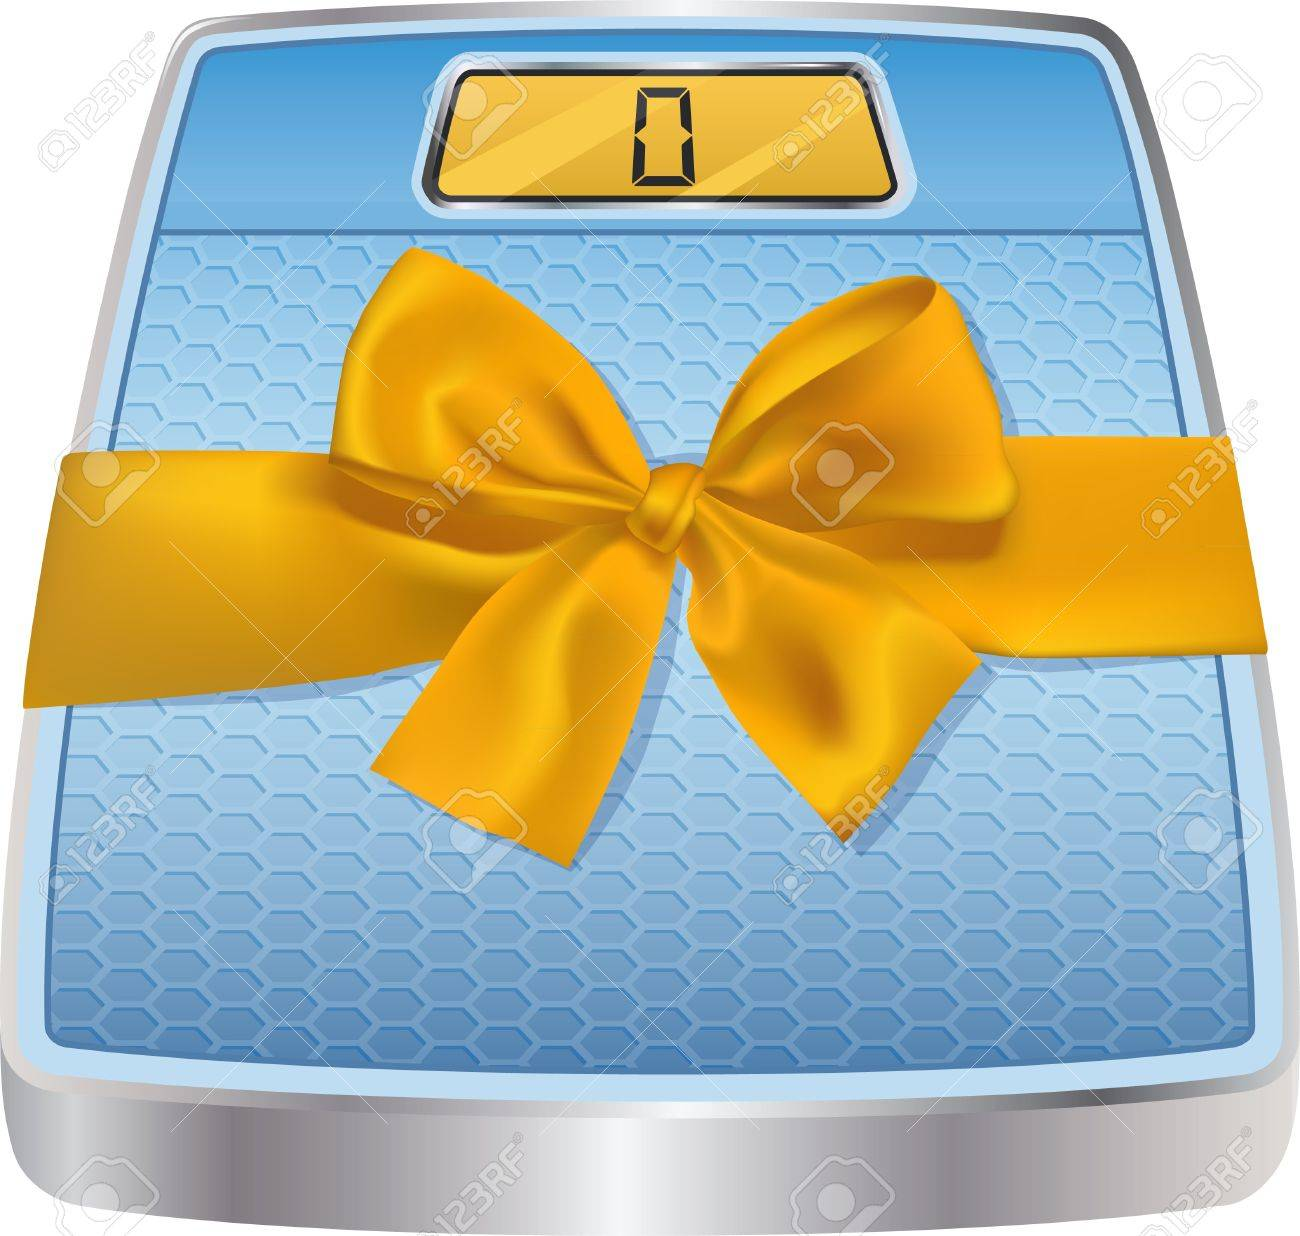 Bathroom Gift Illustration Of Digital Bathroom Scale With Yellow Gift Bow